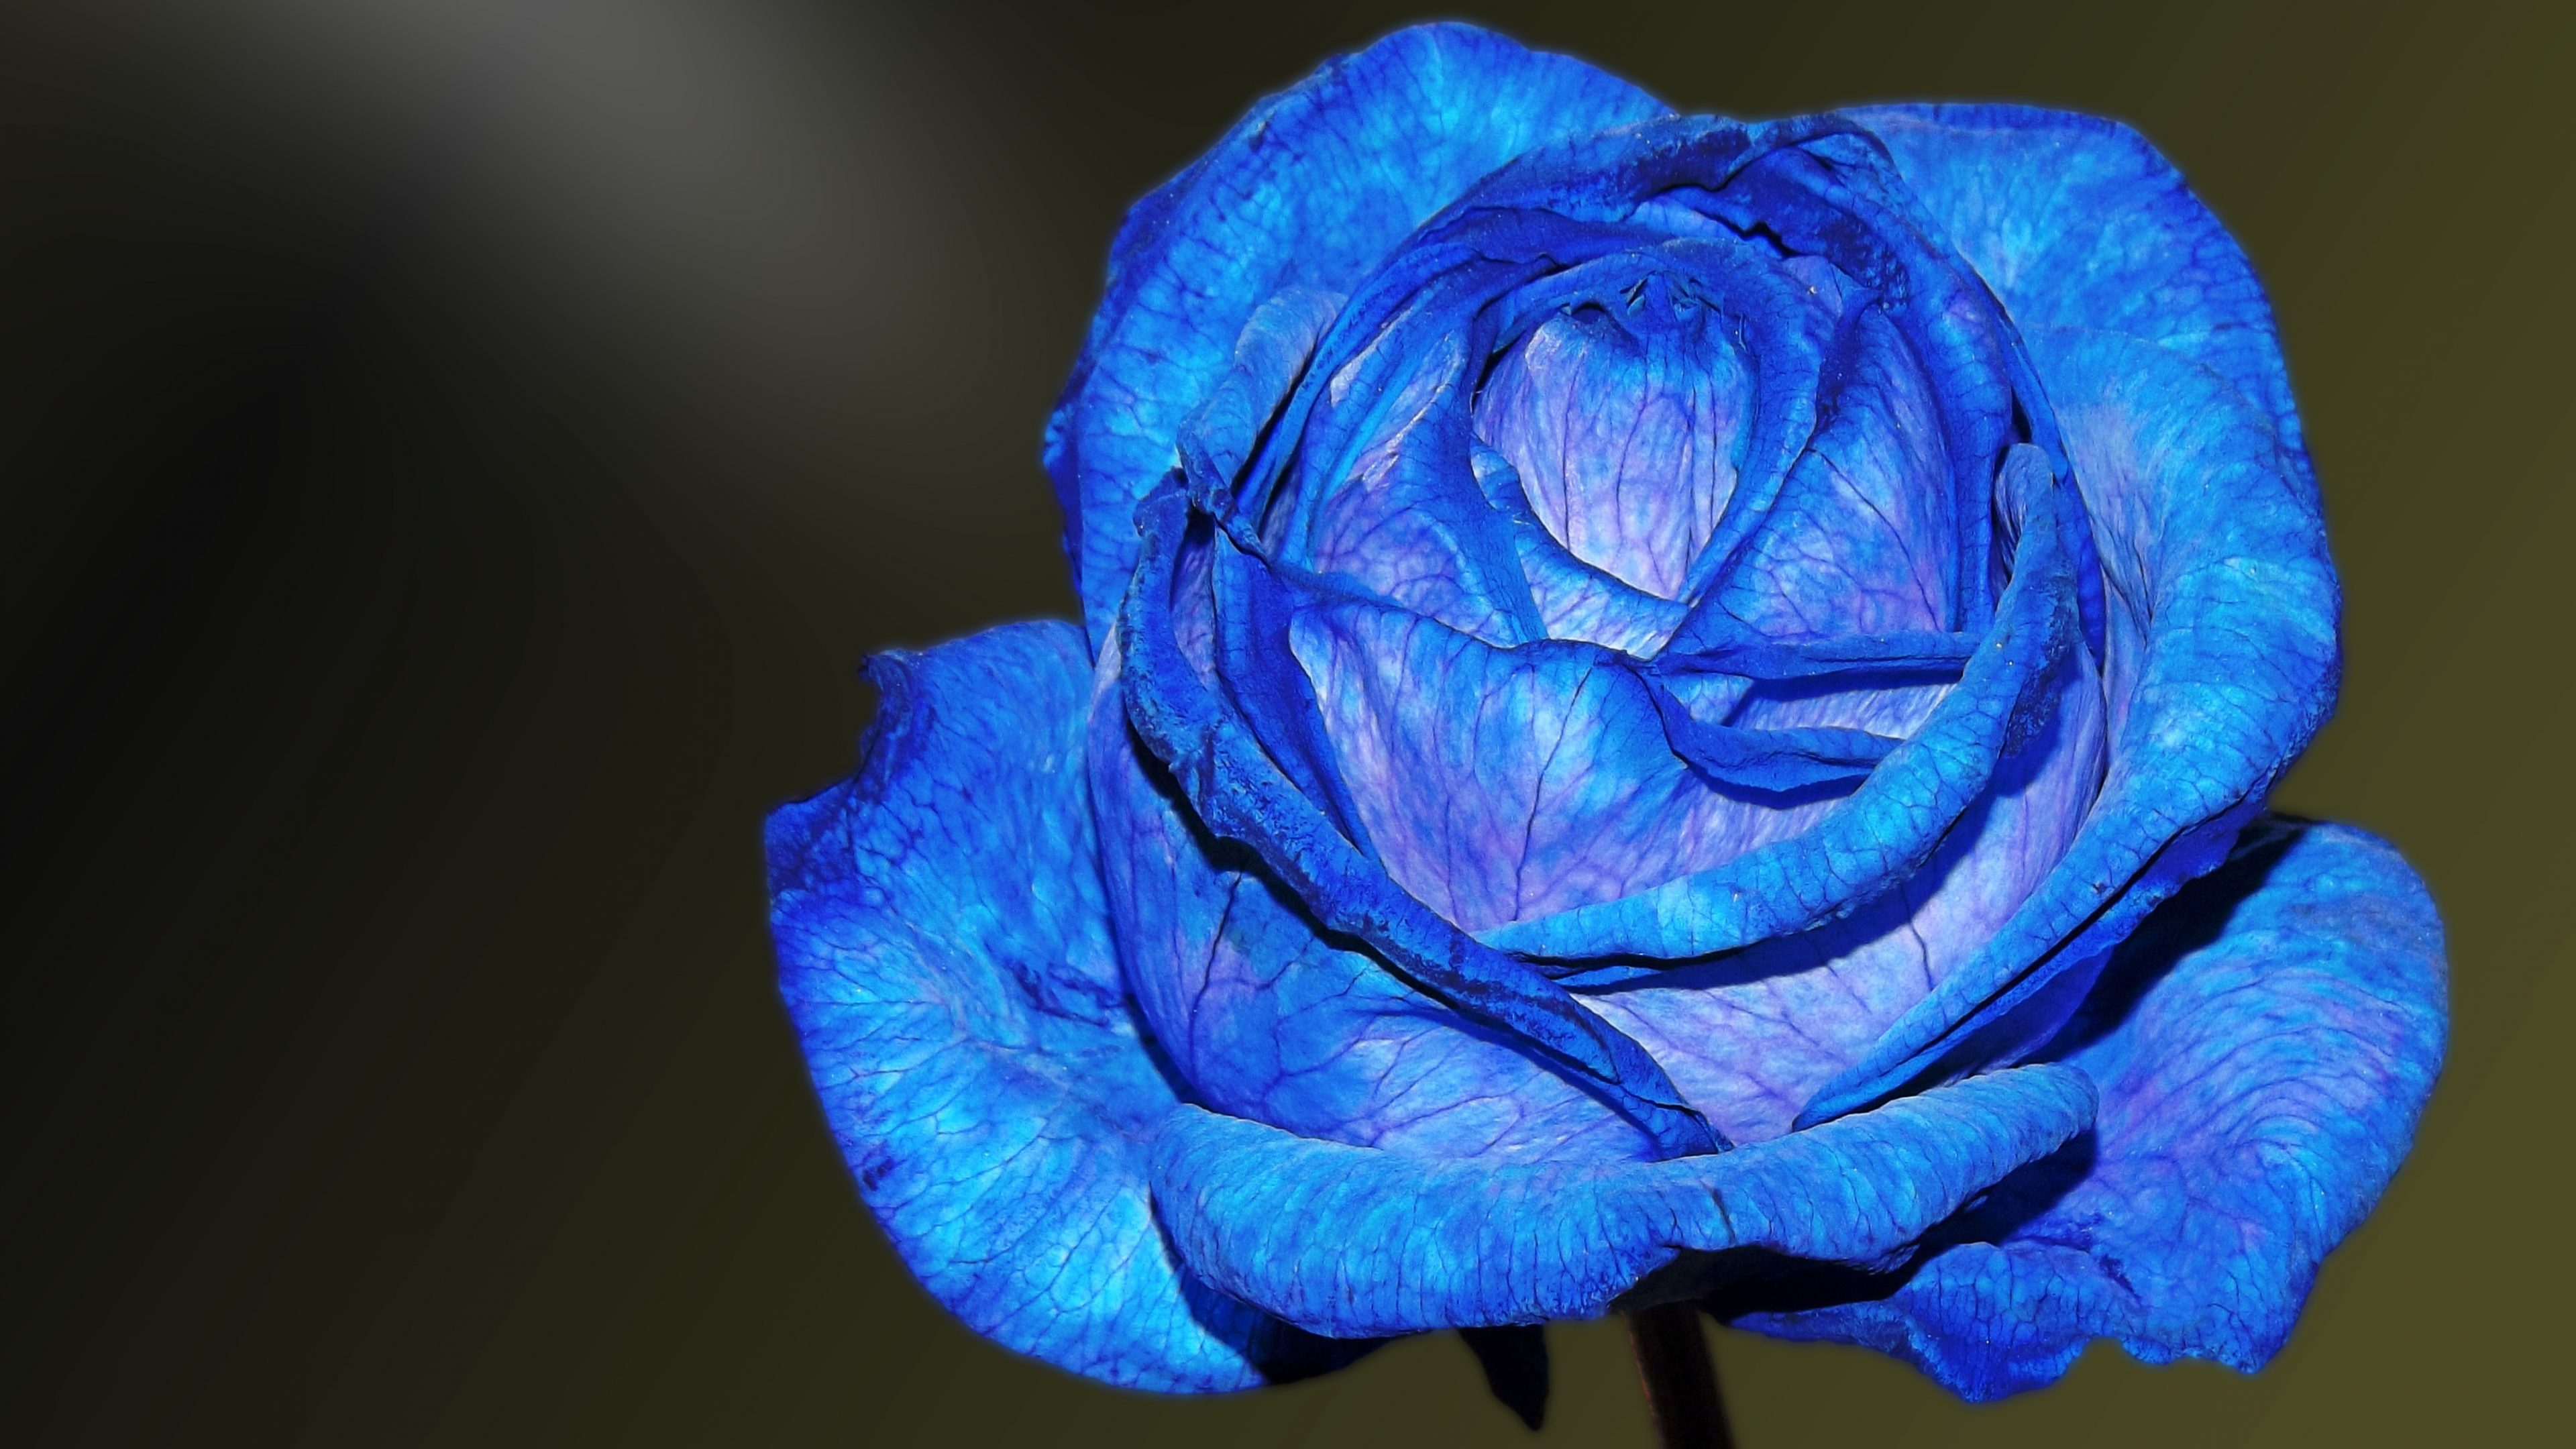 Blue Rose Wallpaper 4k Background Hd Wallpaper Background